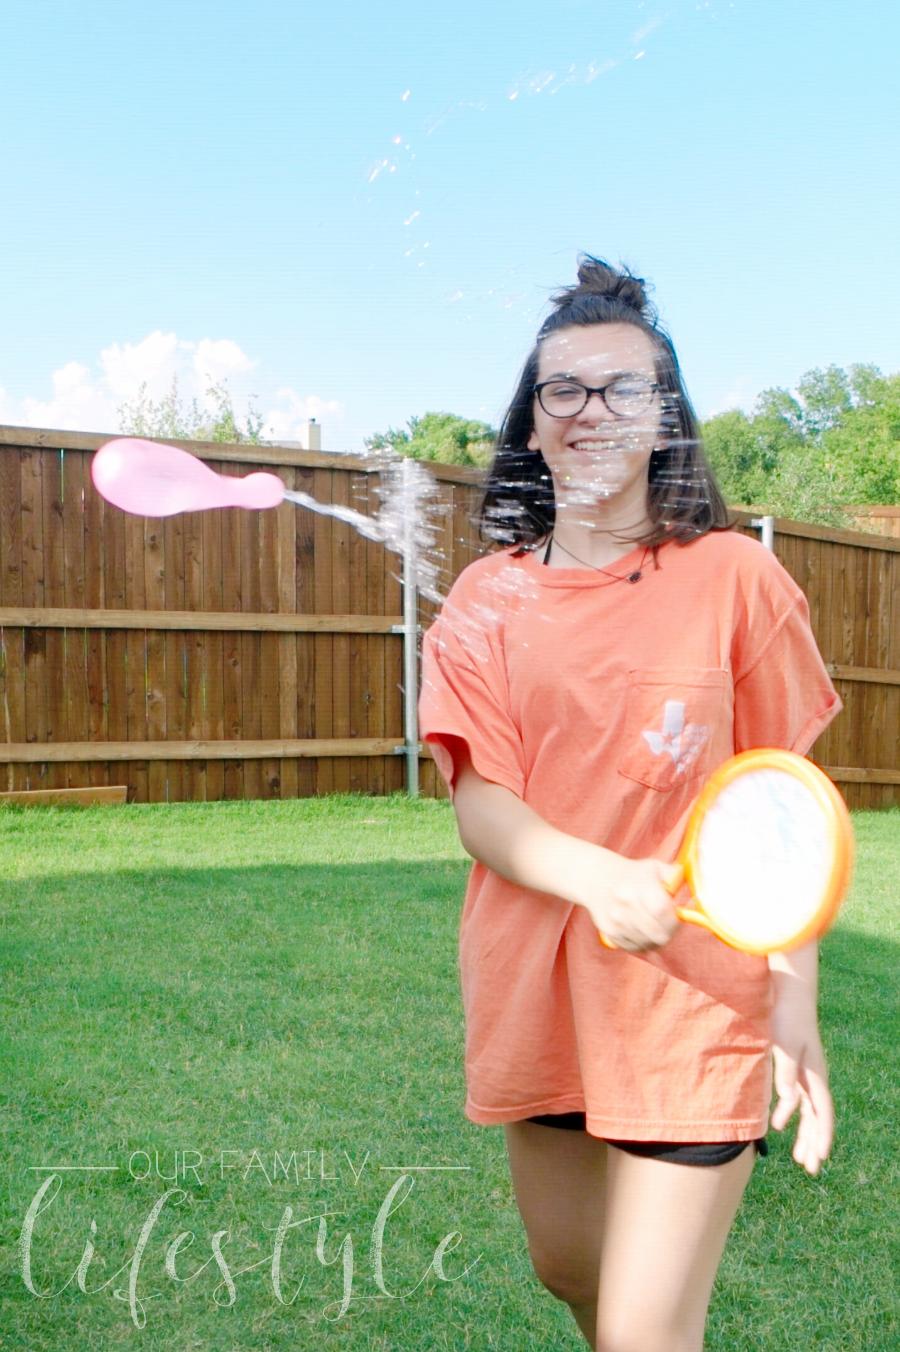 water balloon yard tennis